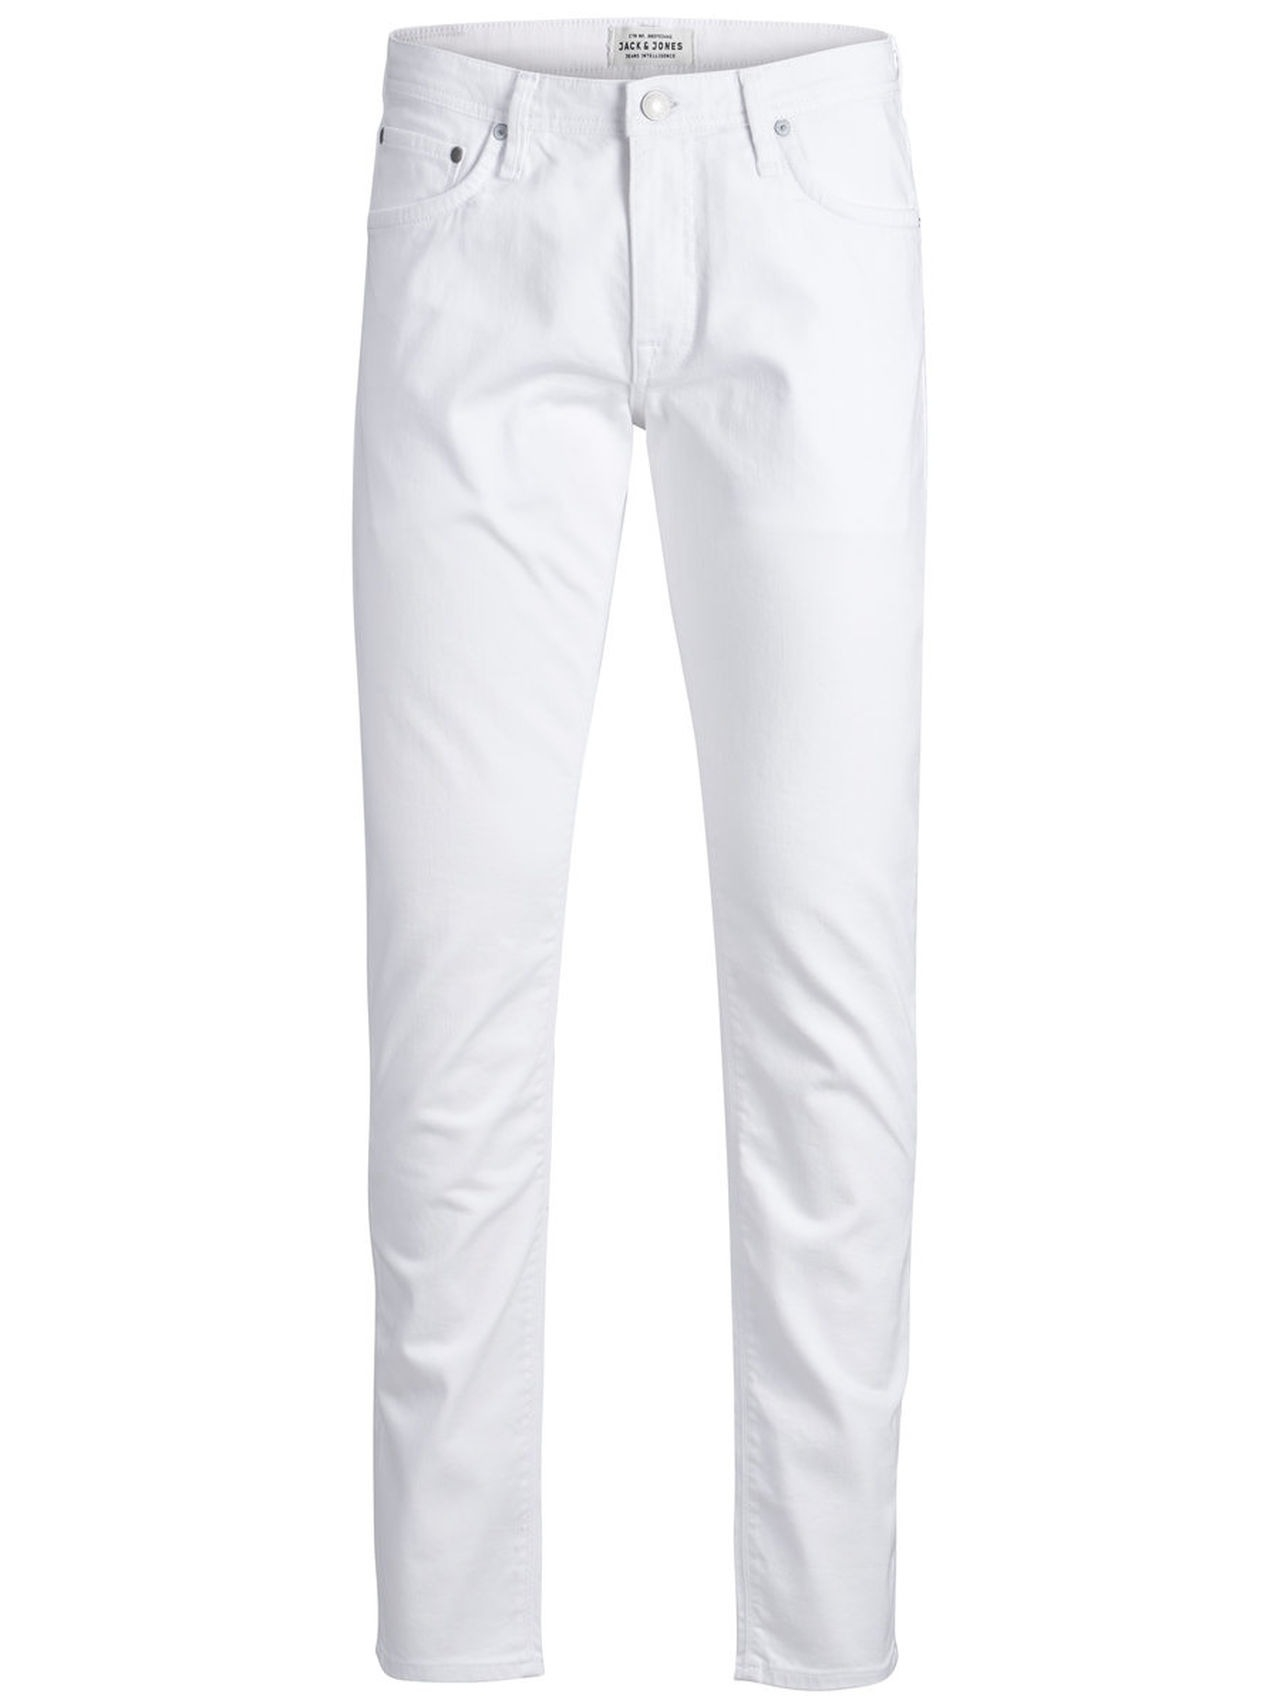 JACK & JONES Glenn Felix Jos 453 Slim Fit Jeans Man White